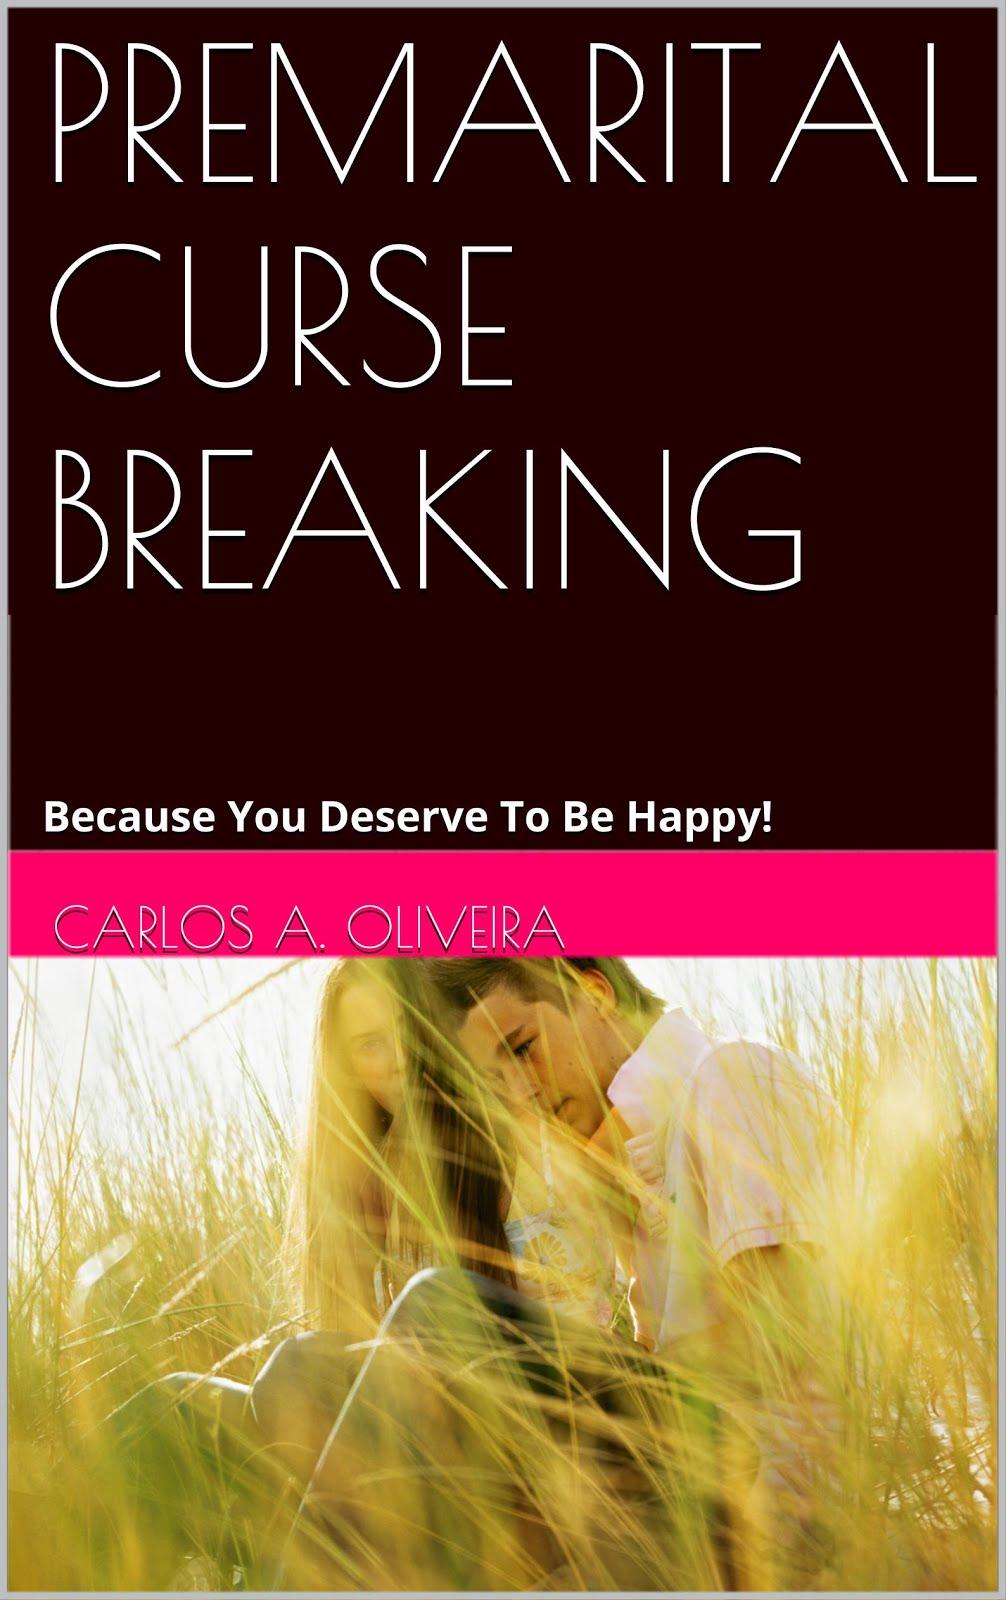 premarital and singleness curse breaking